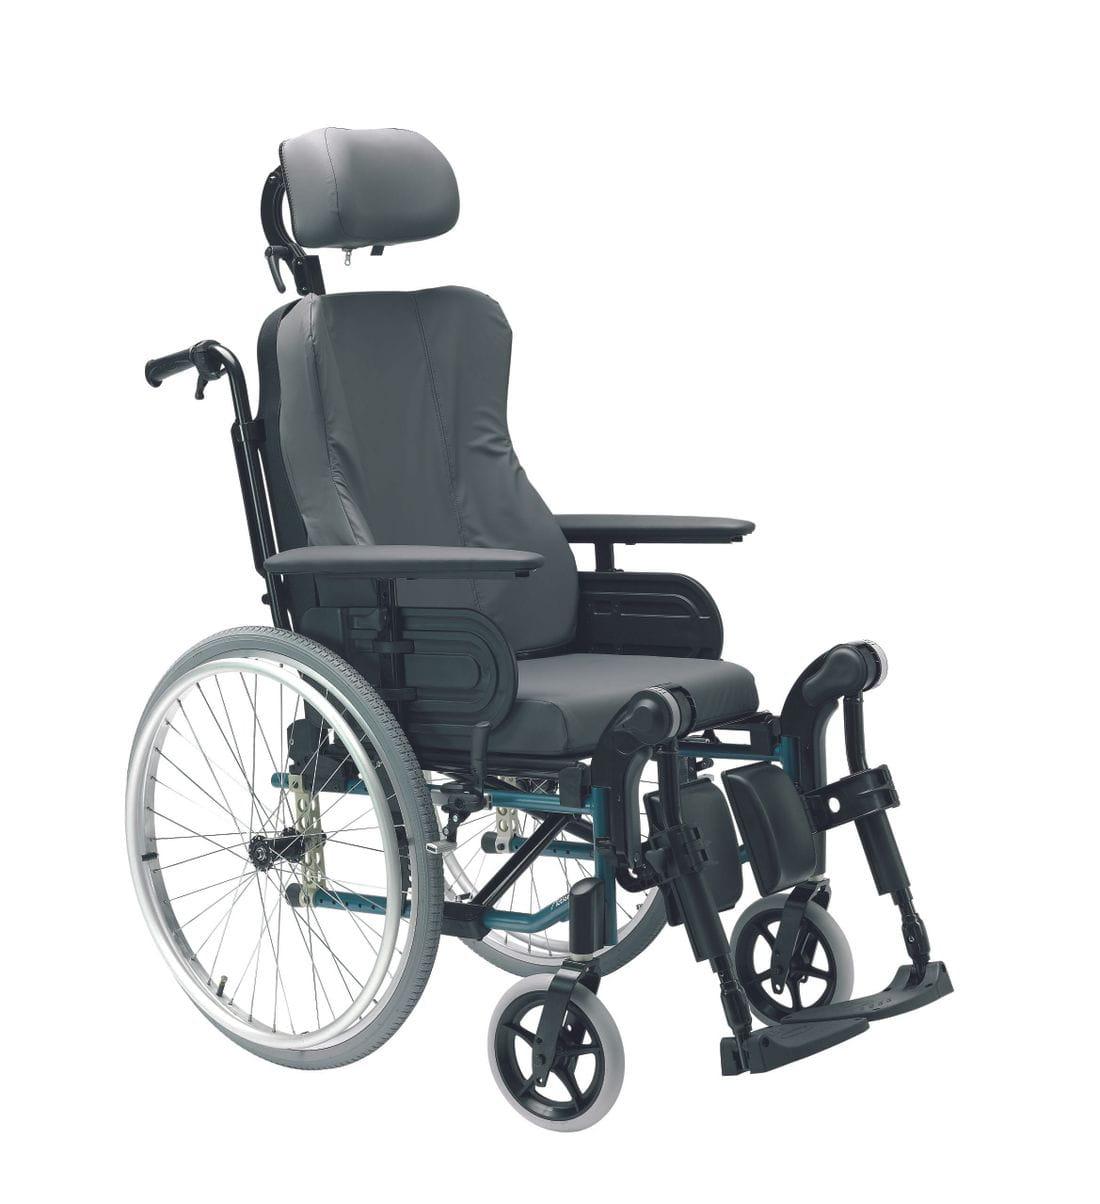 Silla de ruedas manual Action 3NG Comfort